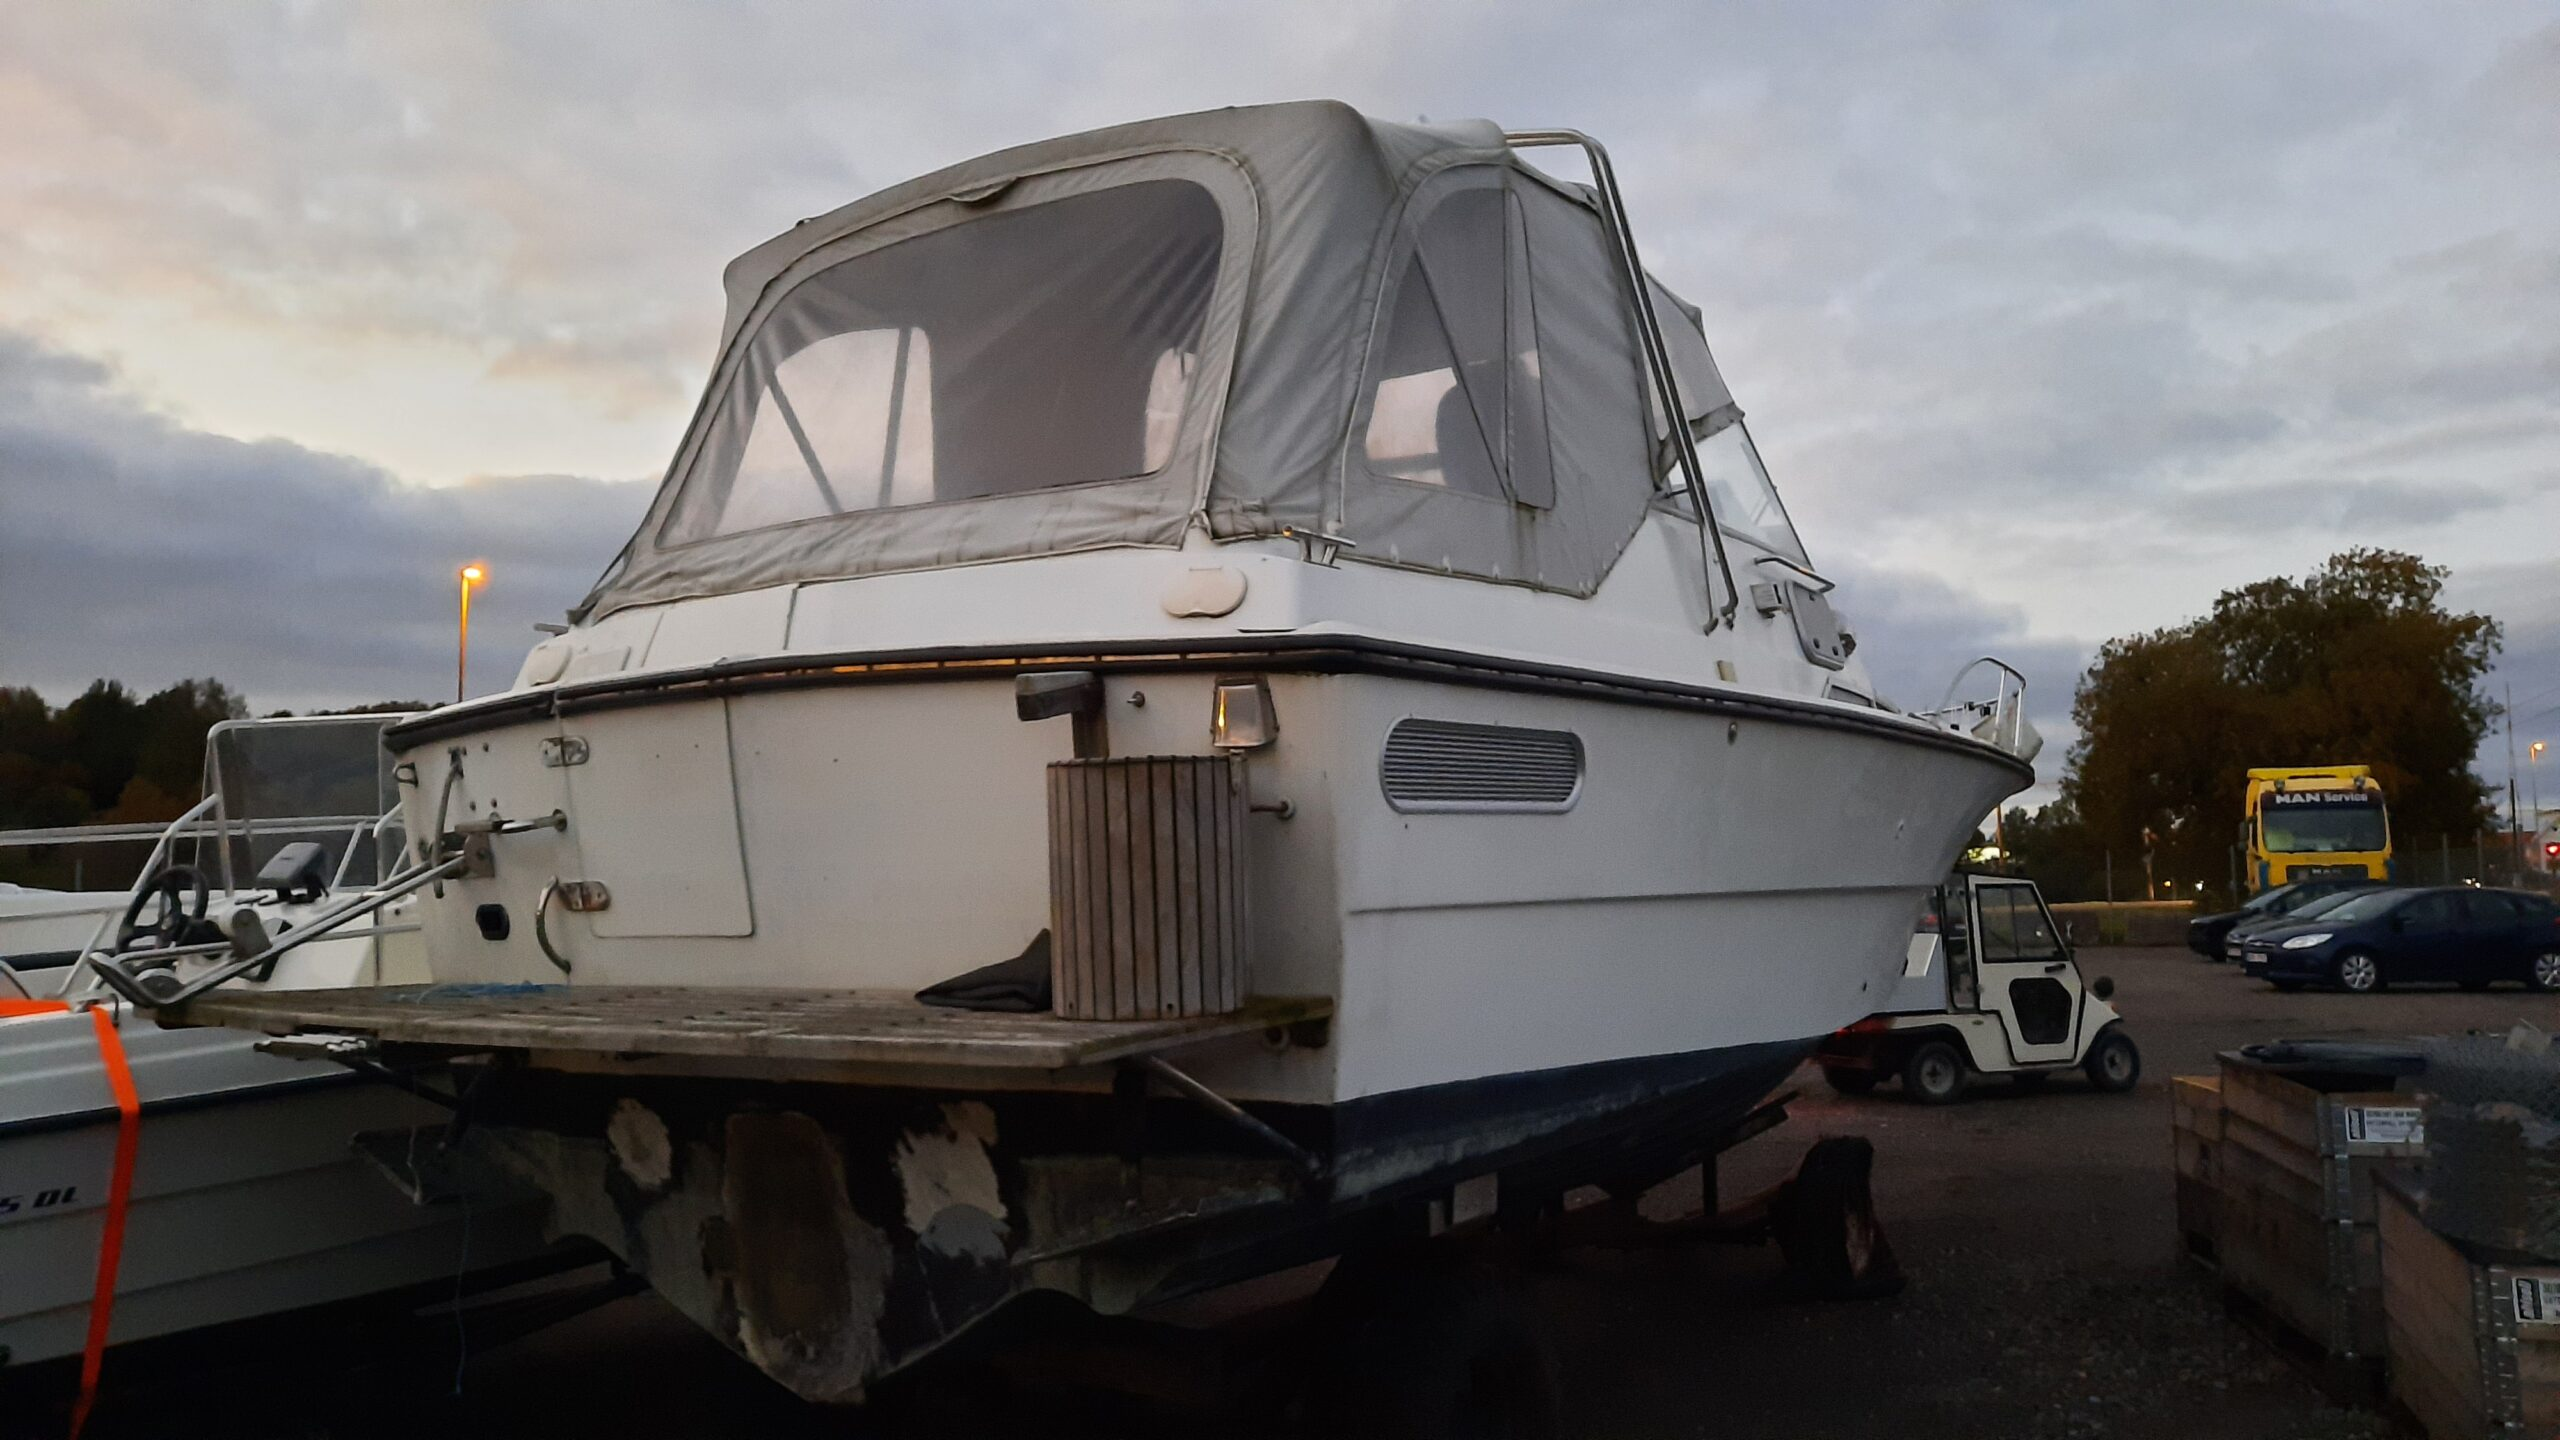 Båt fjord bak